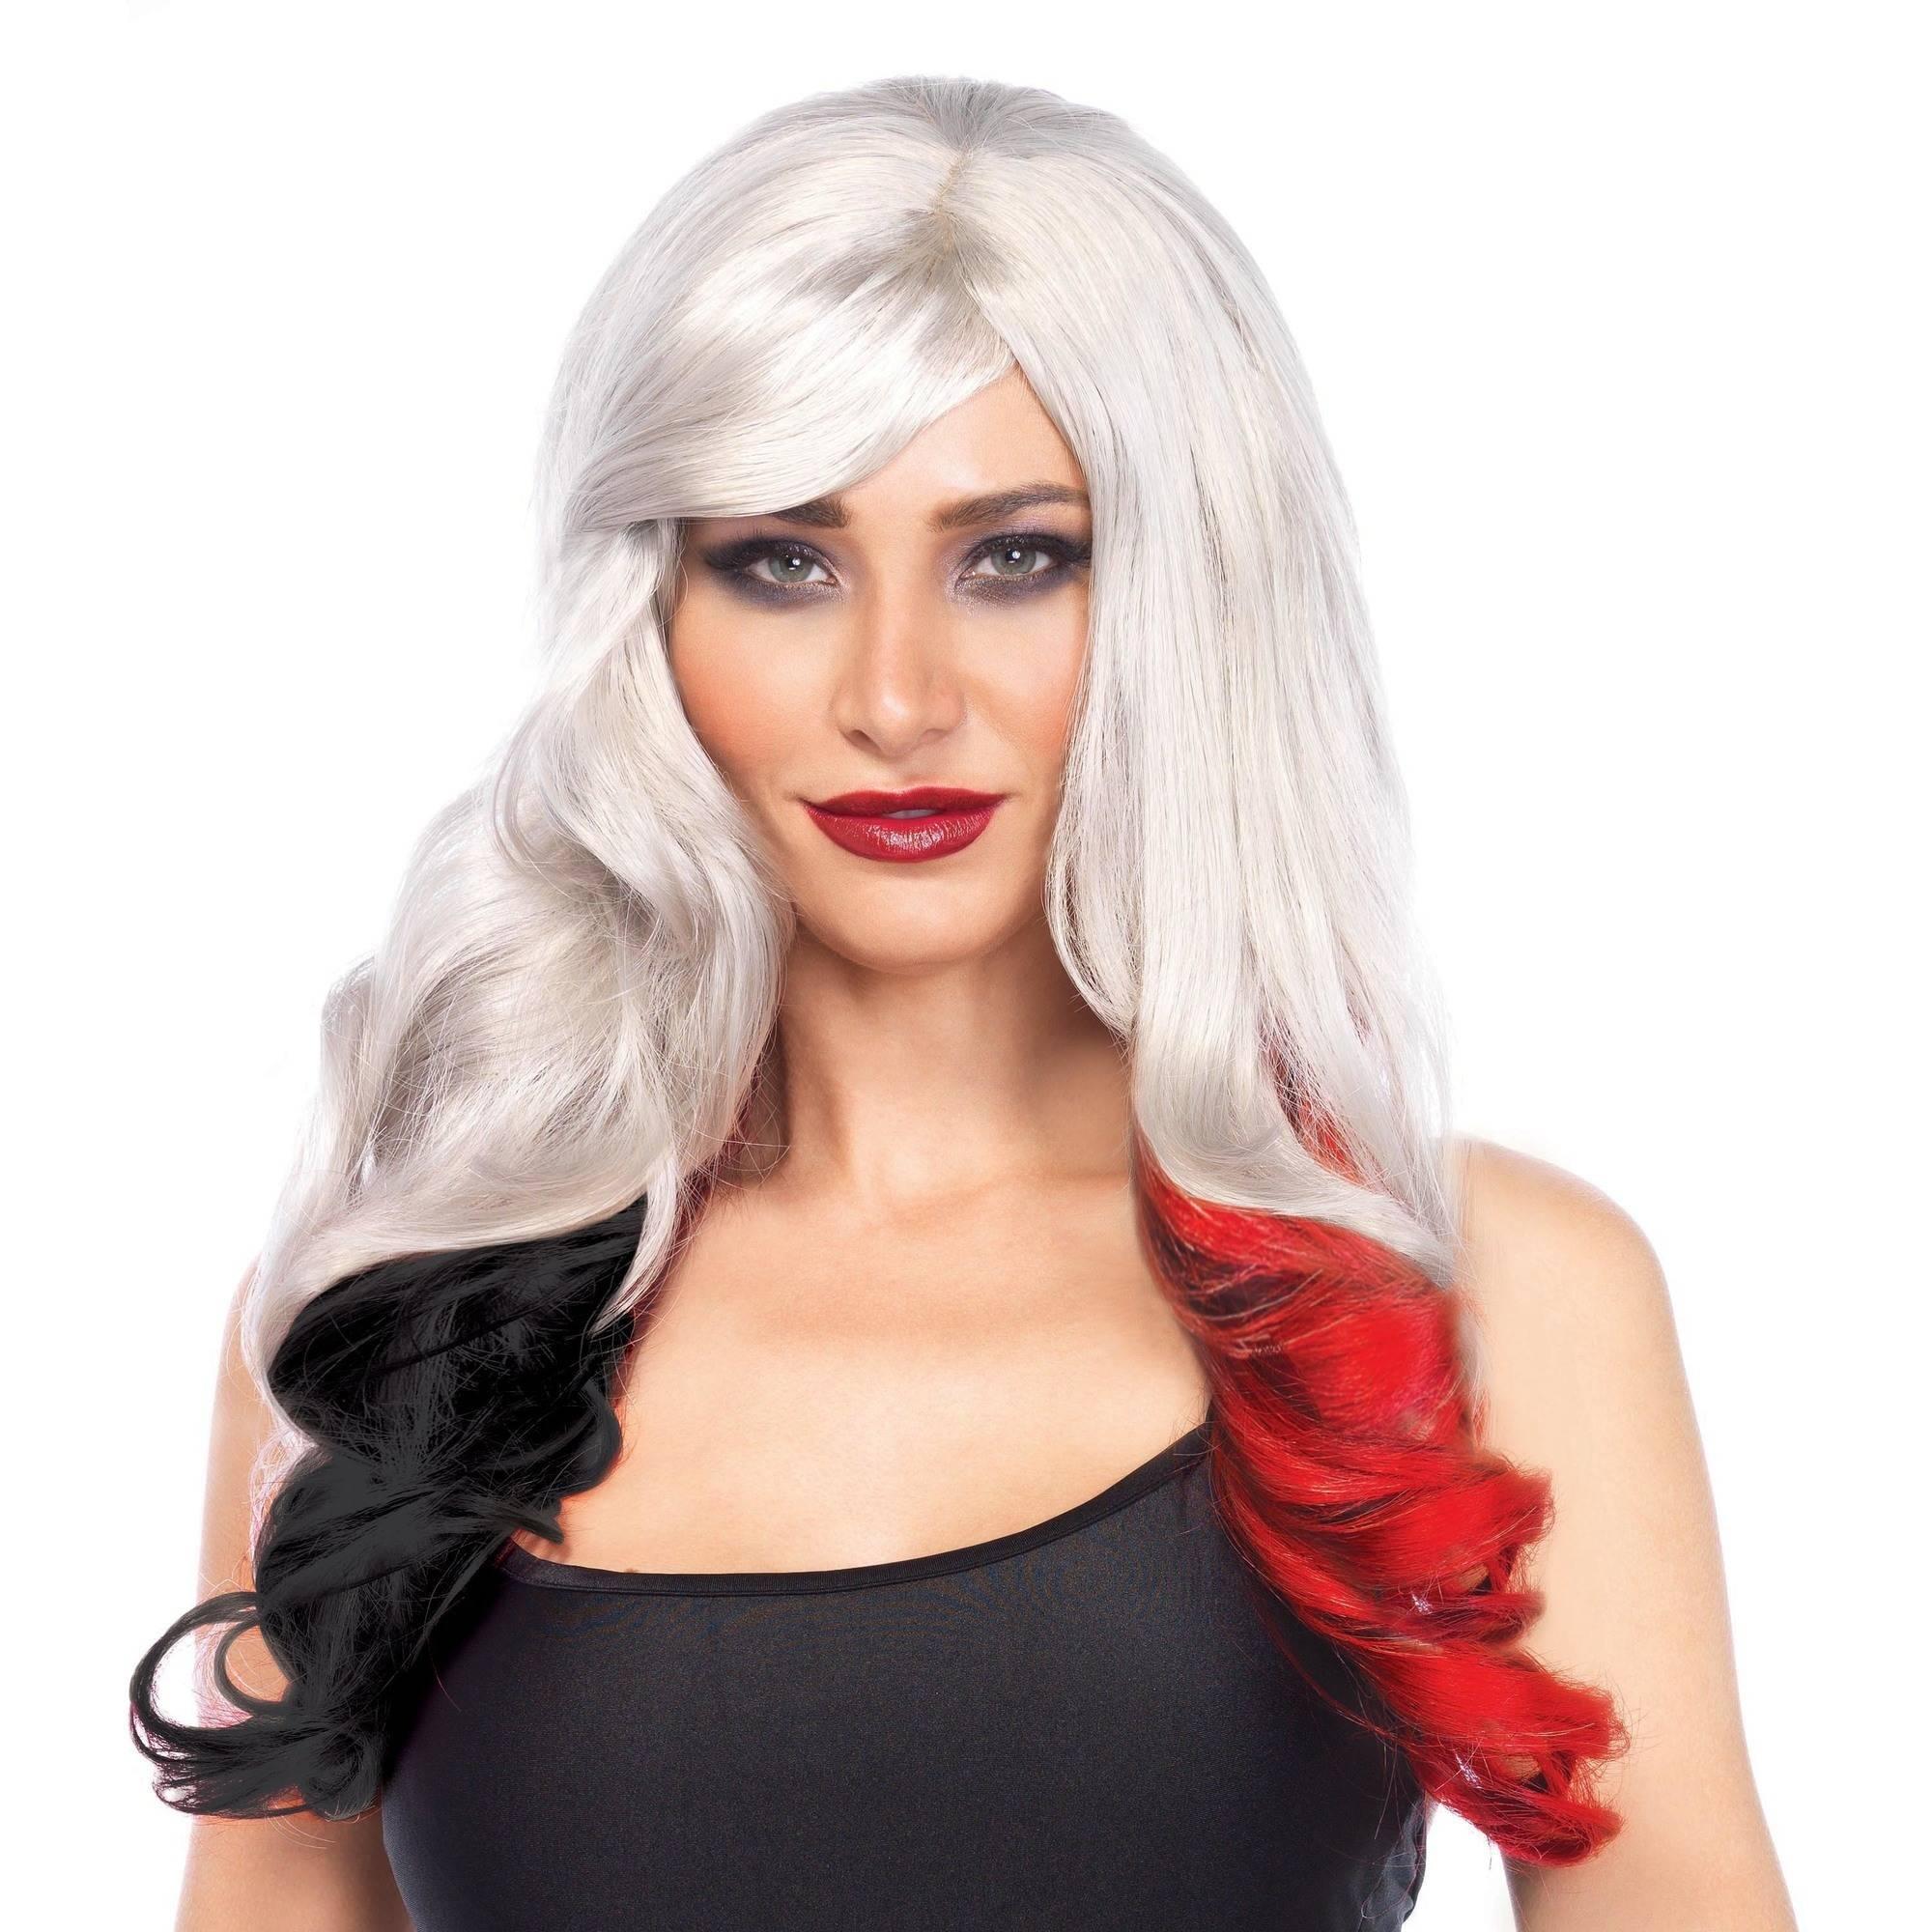 Allure Wig Halloween Costume Accessory - Walmart.com